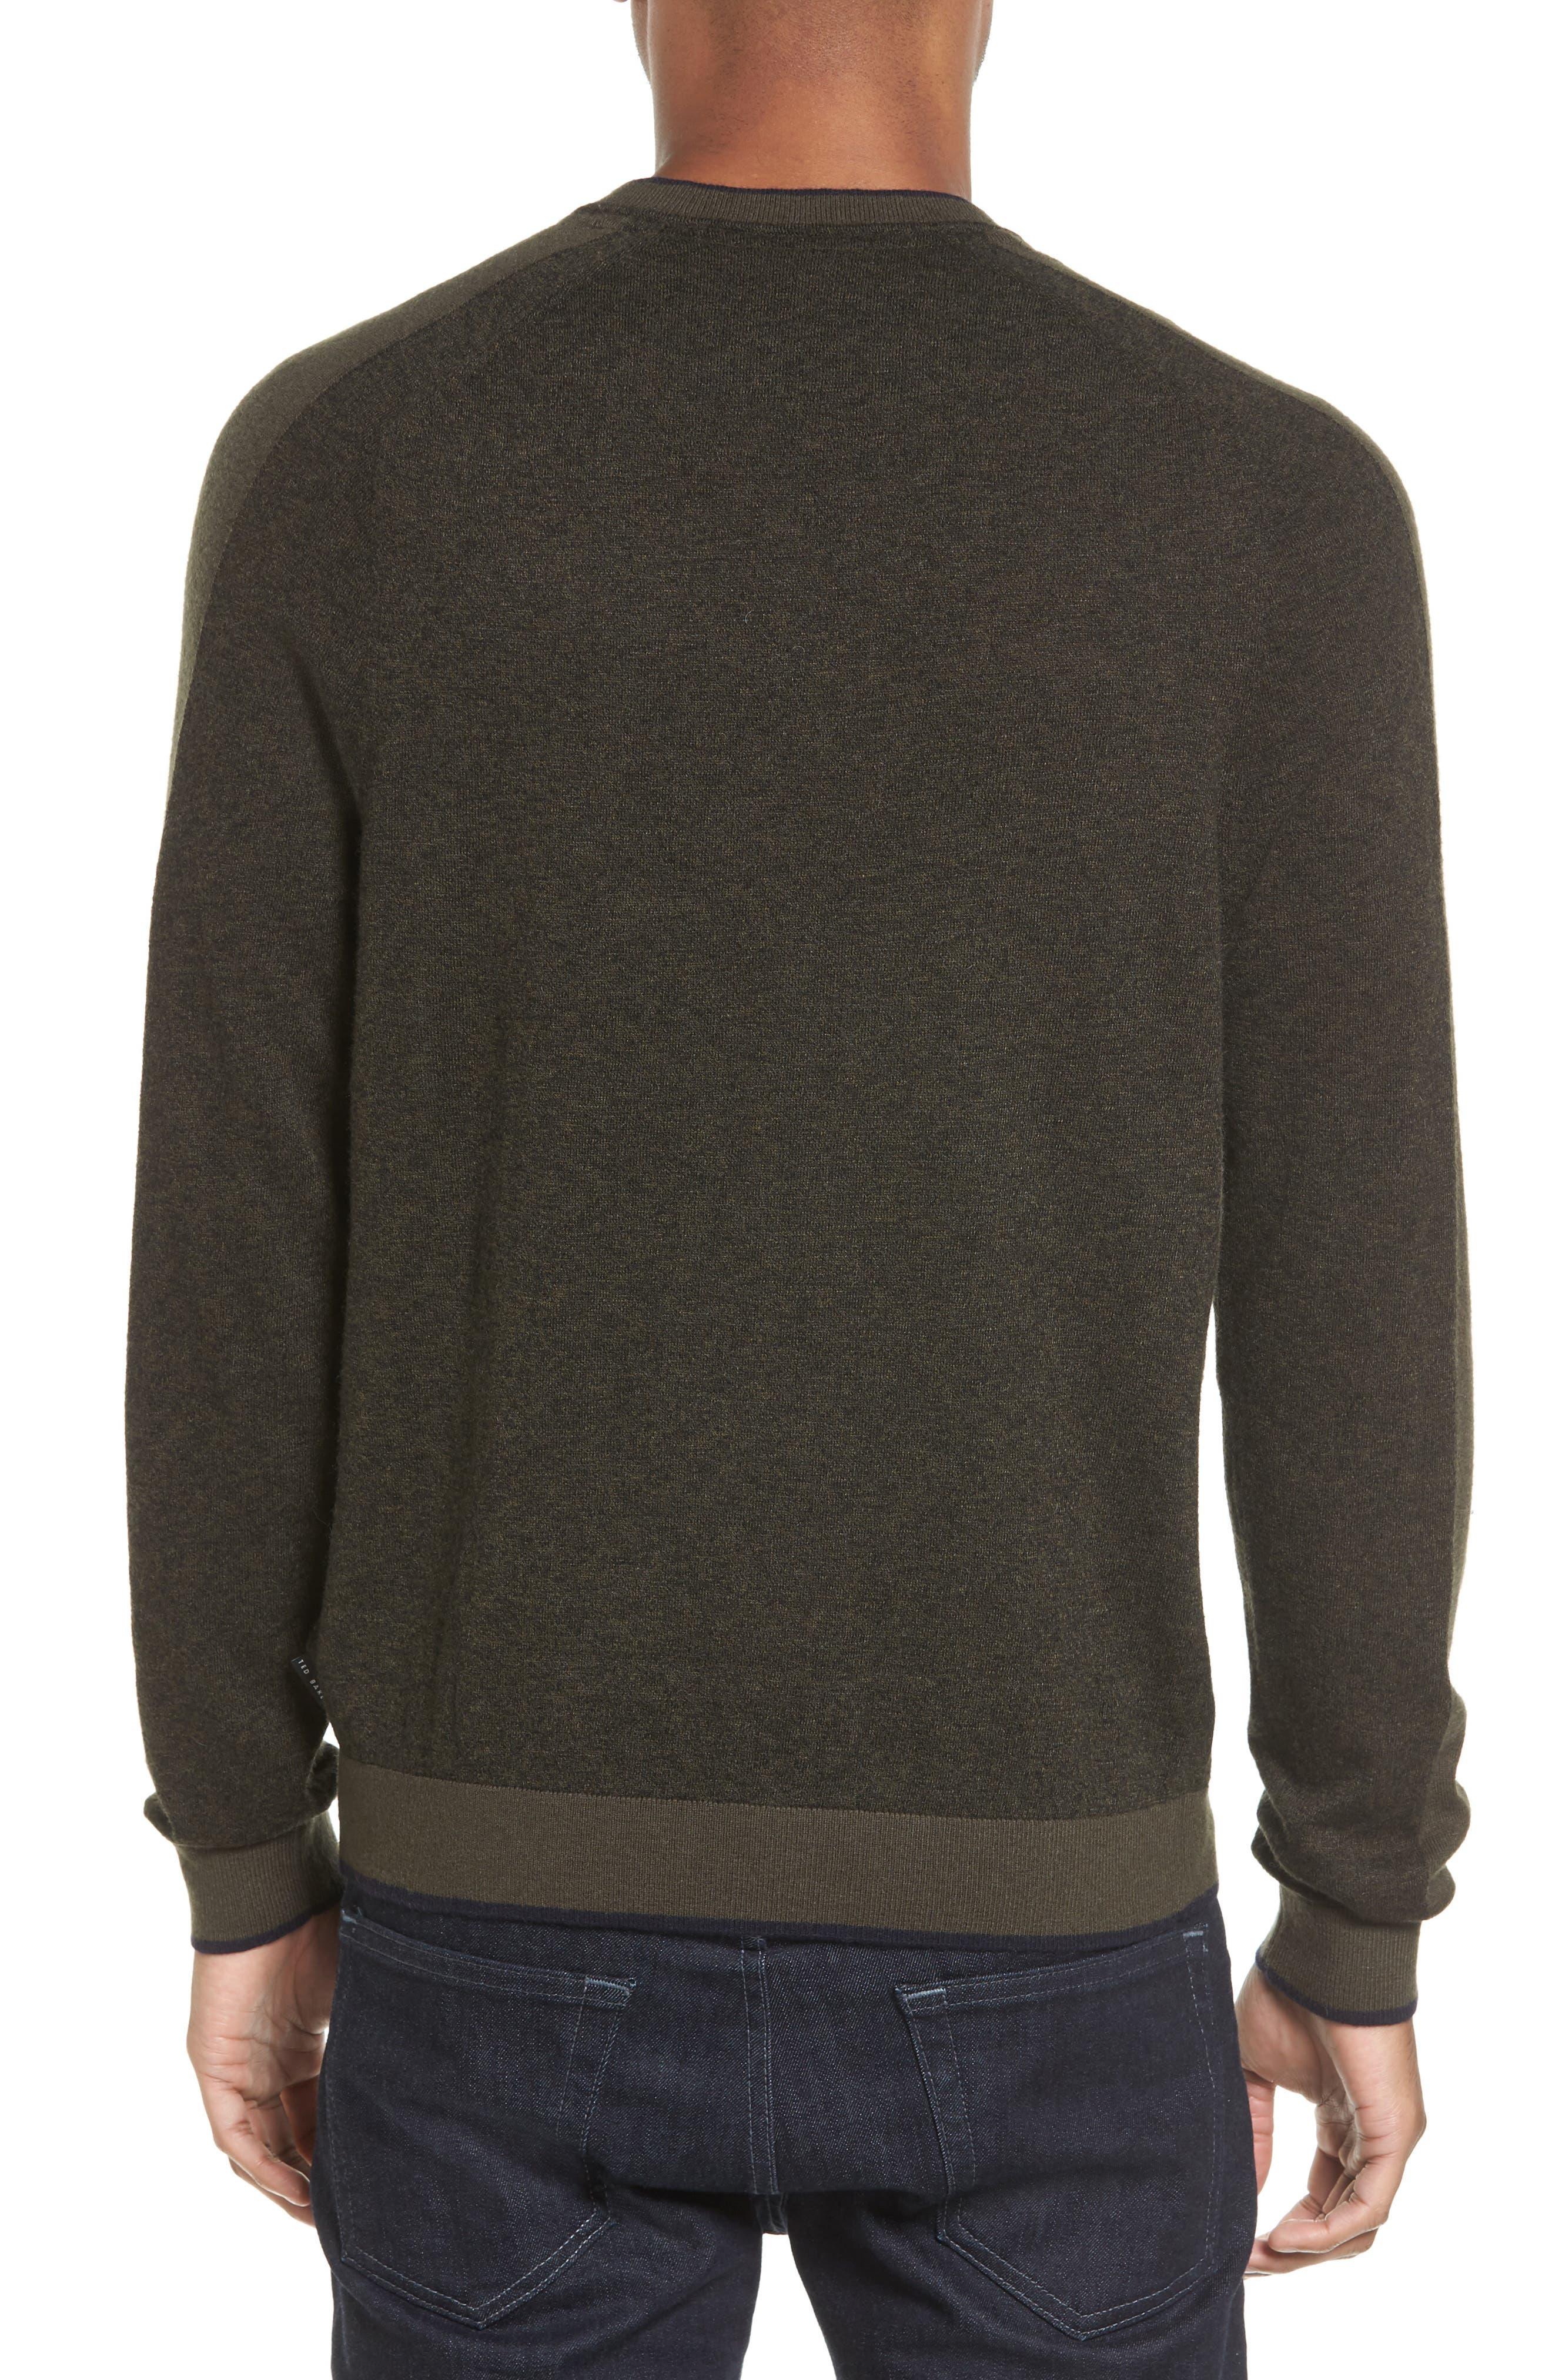 Norpol Crewneck Sweater,                             Alternate thumbnail 6, color,